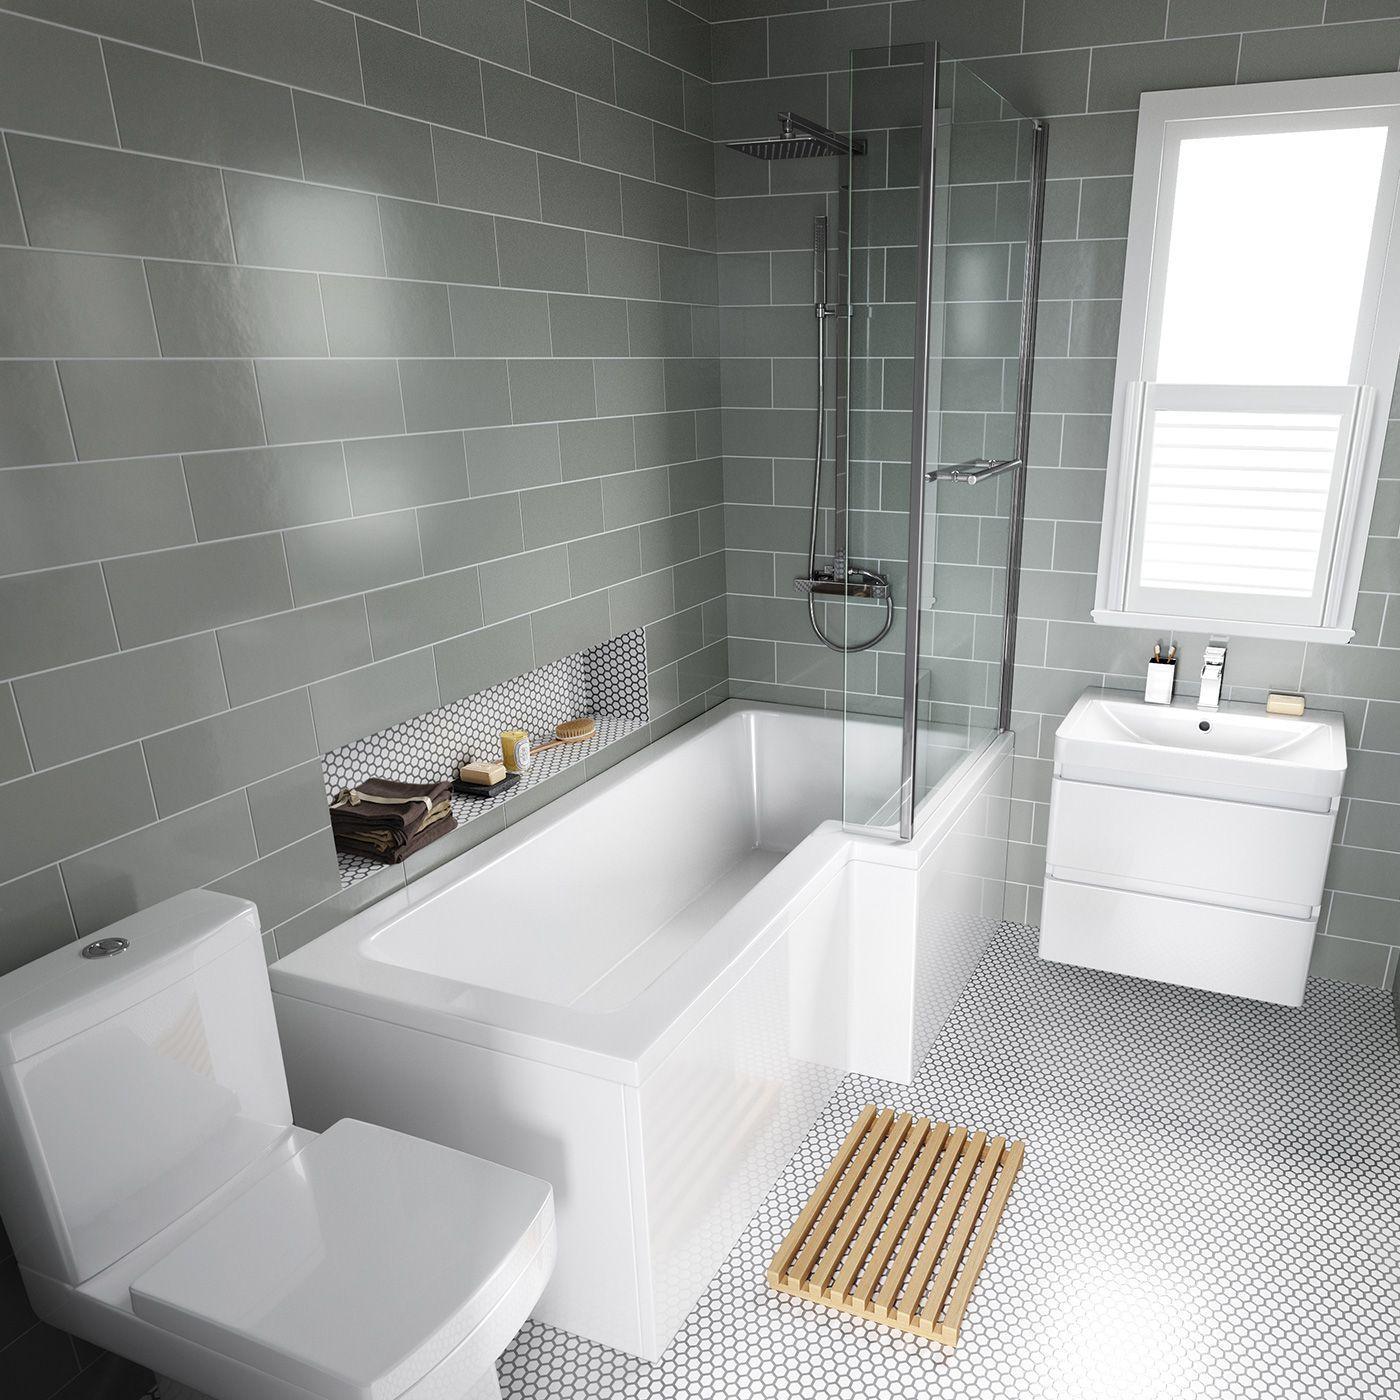 Master bedroom bathroom layout   Extraordinary Bathroom Ideas   KILLER Tips for Your Small